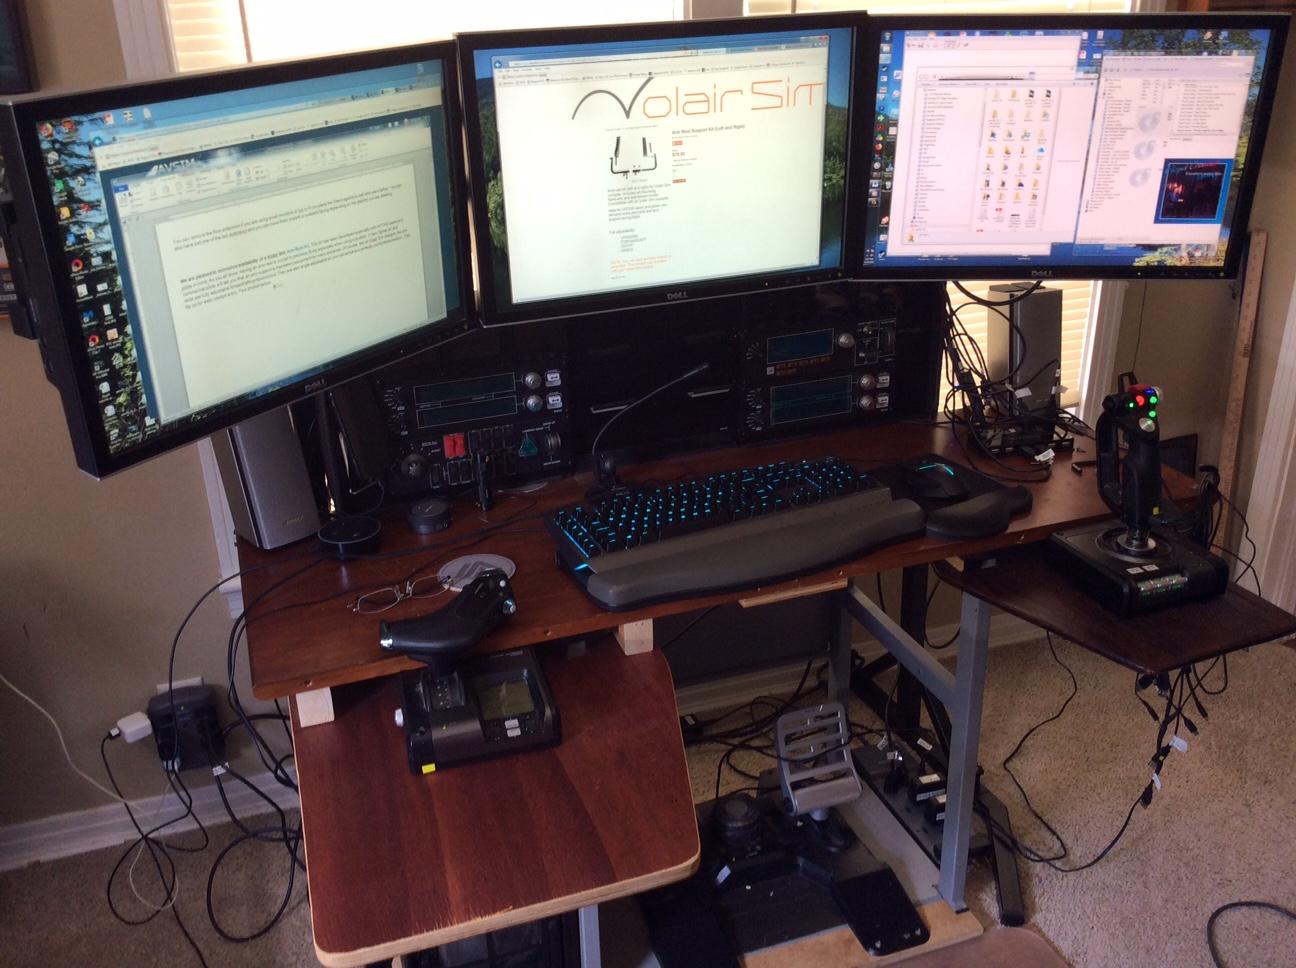 Volair Sim Large Display Stand - Hardware - The AVSIM Community